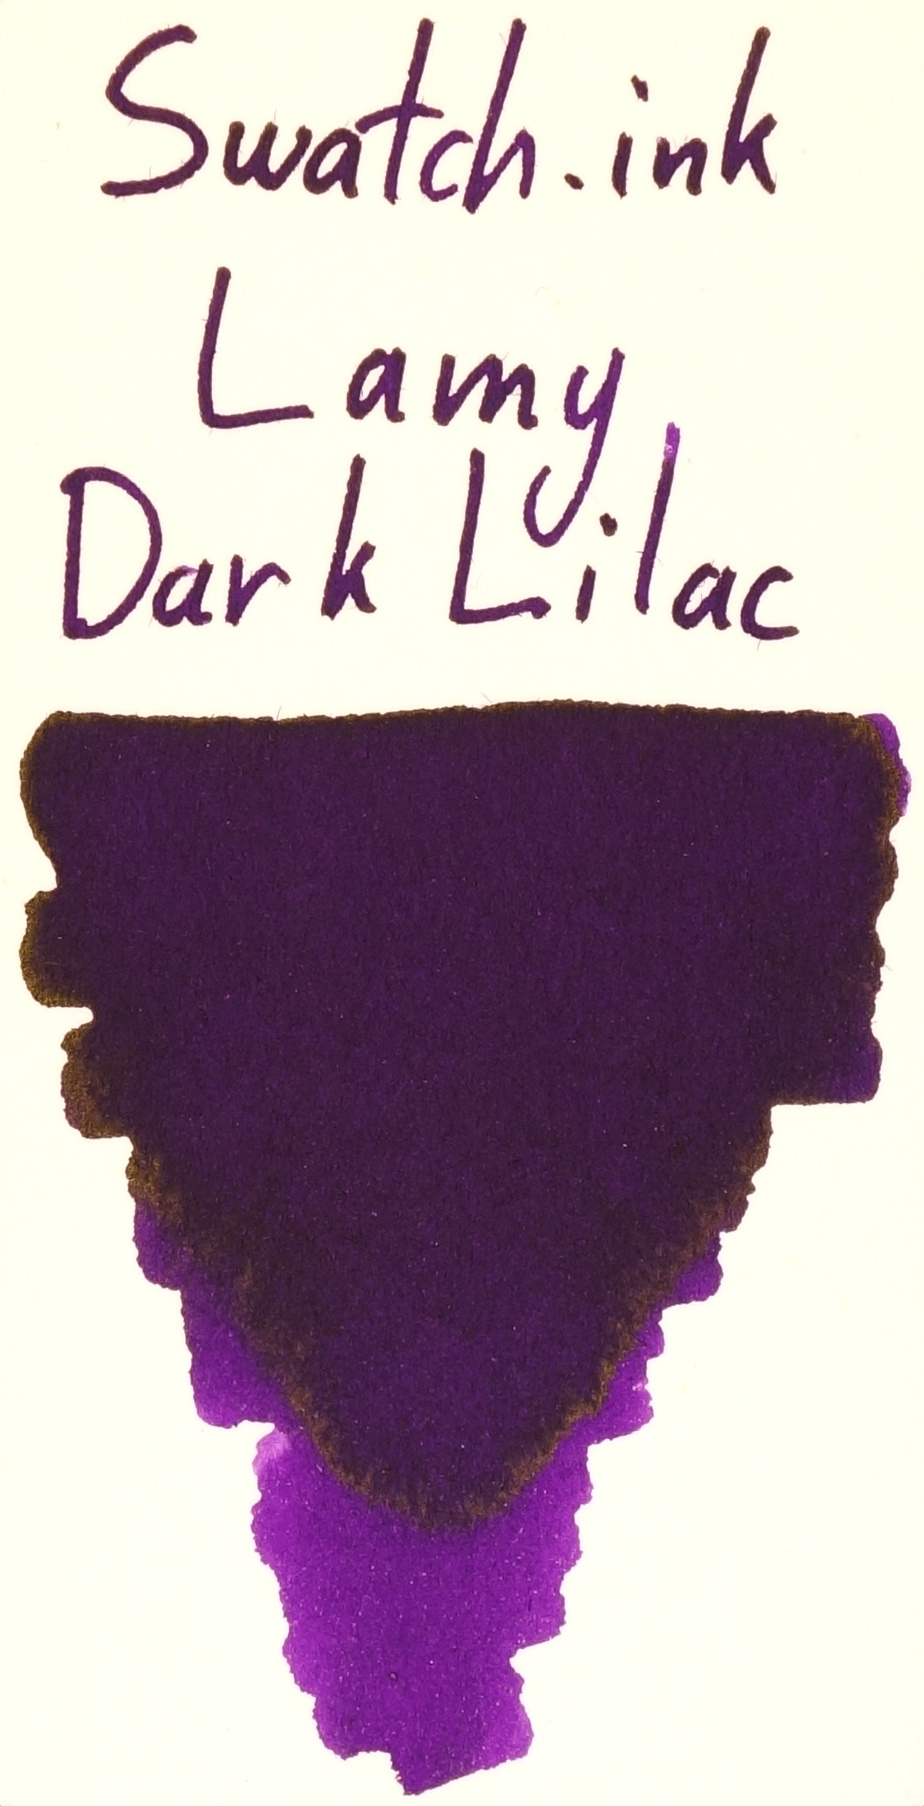 Lamy Dark Lilac Swatch.ink.JPG